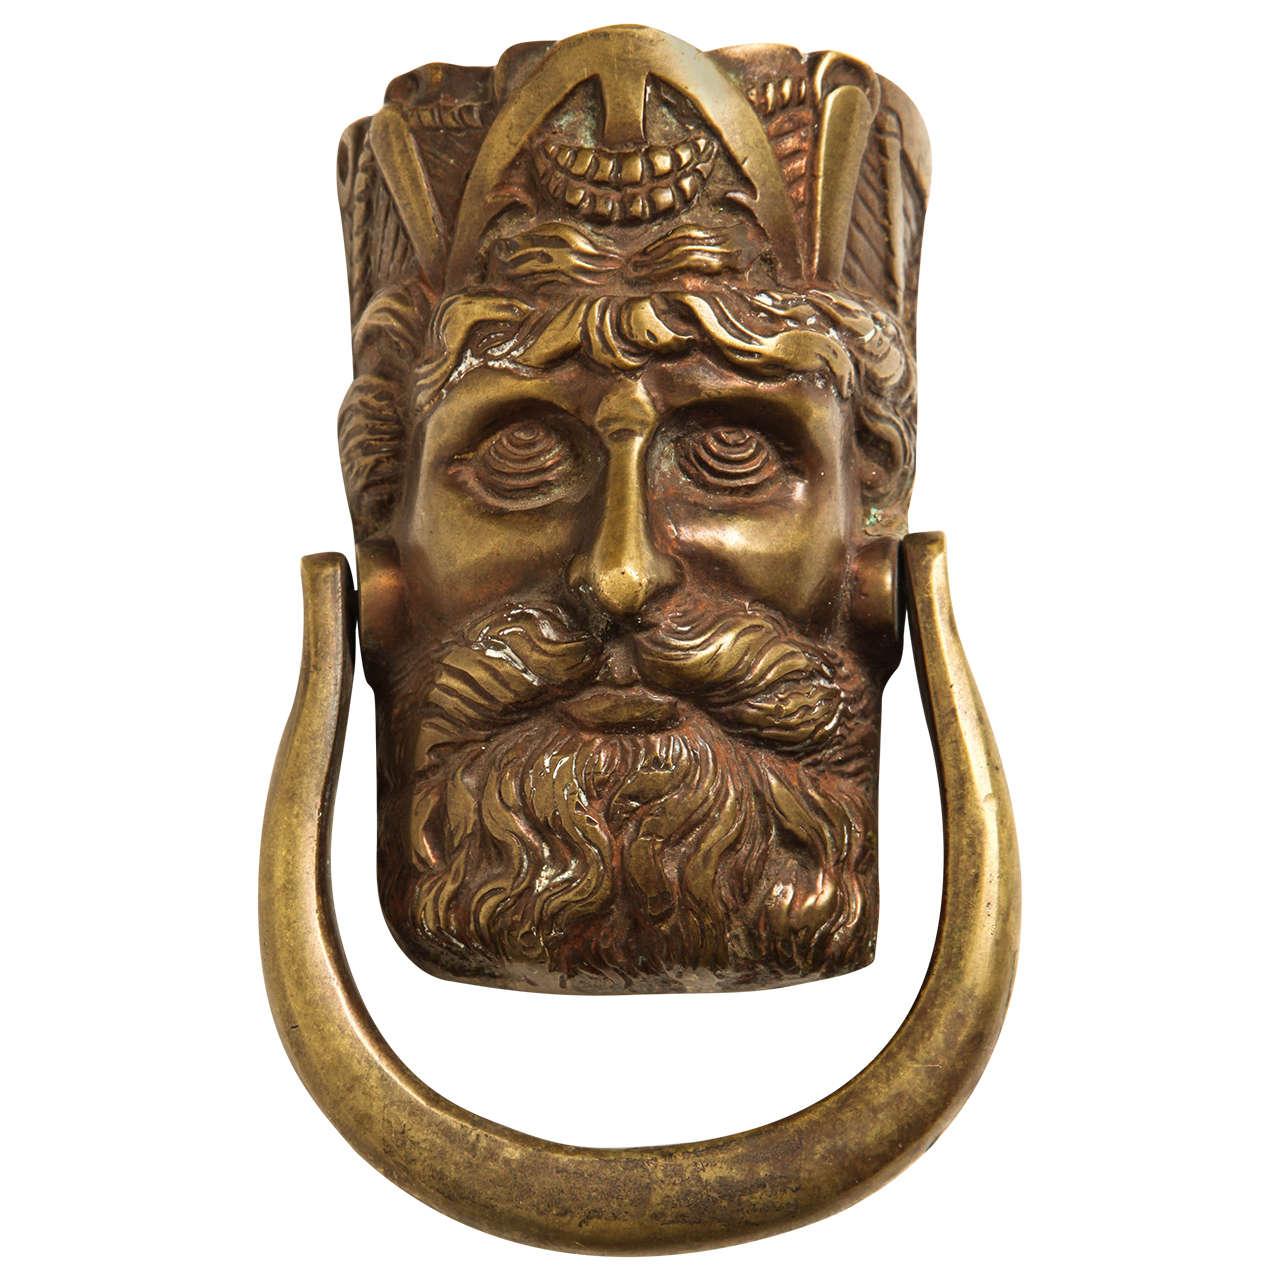 19th Century Irish Figural Door Knocker